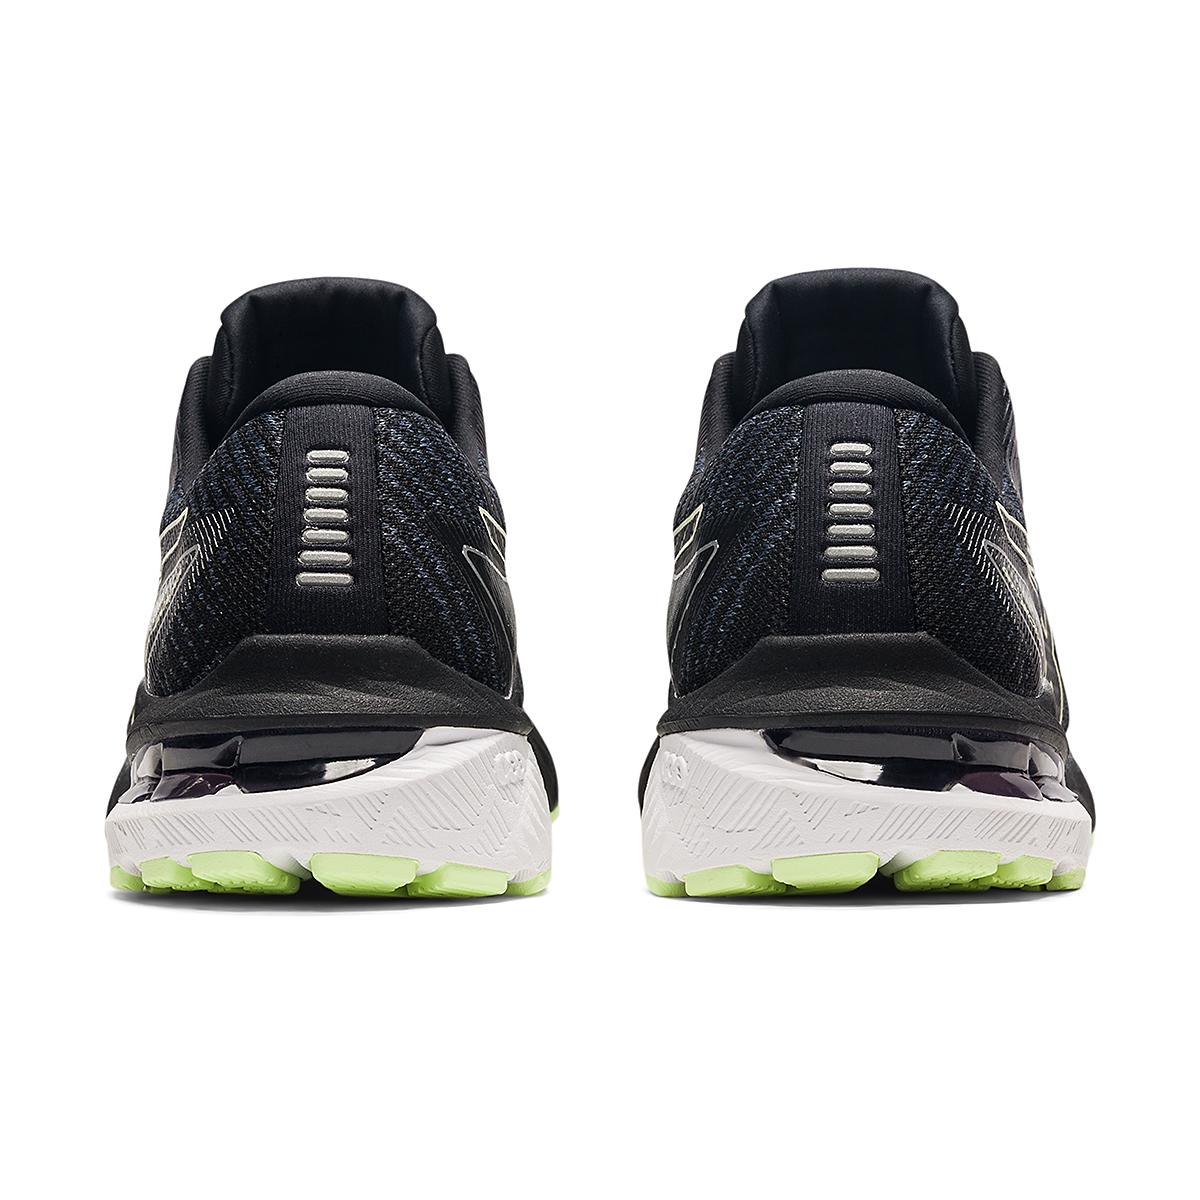 Women's Asics GT-2000 10 Running Shoe - Color: Soft Lavender/Black - Size: 5 - Width: Wide, Soft Lavender/Black, large, image 5